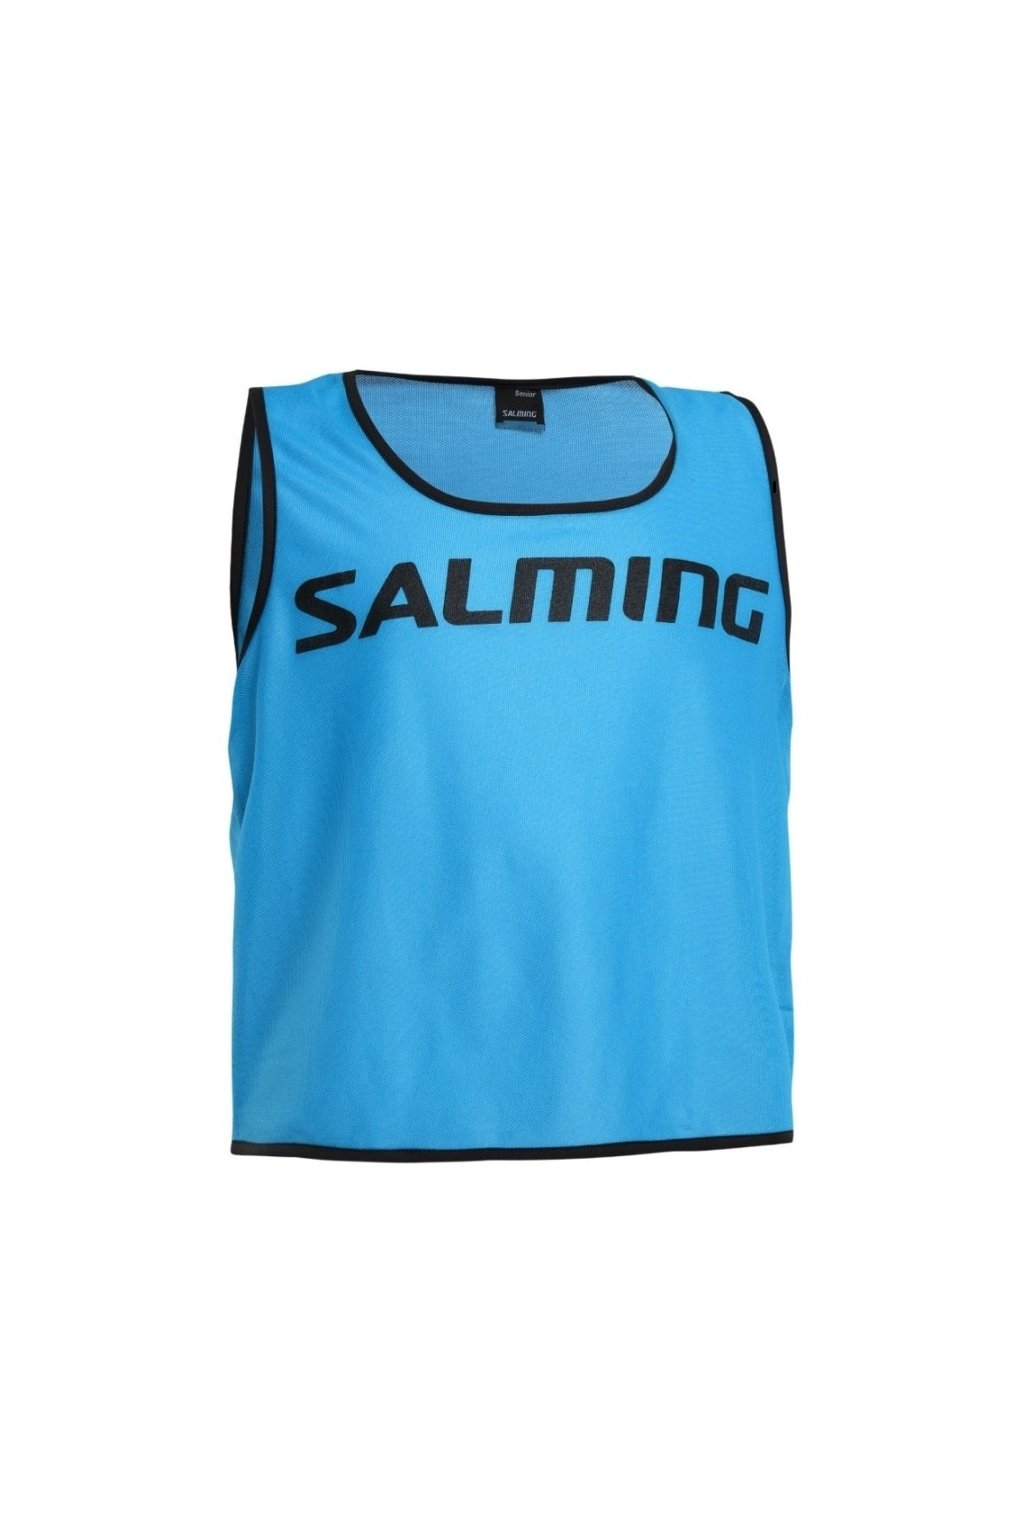 salming training vest (2)